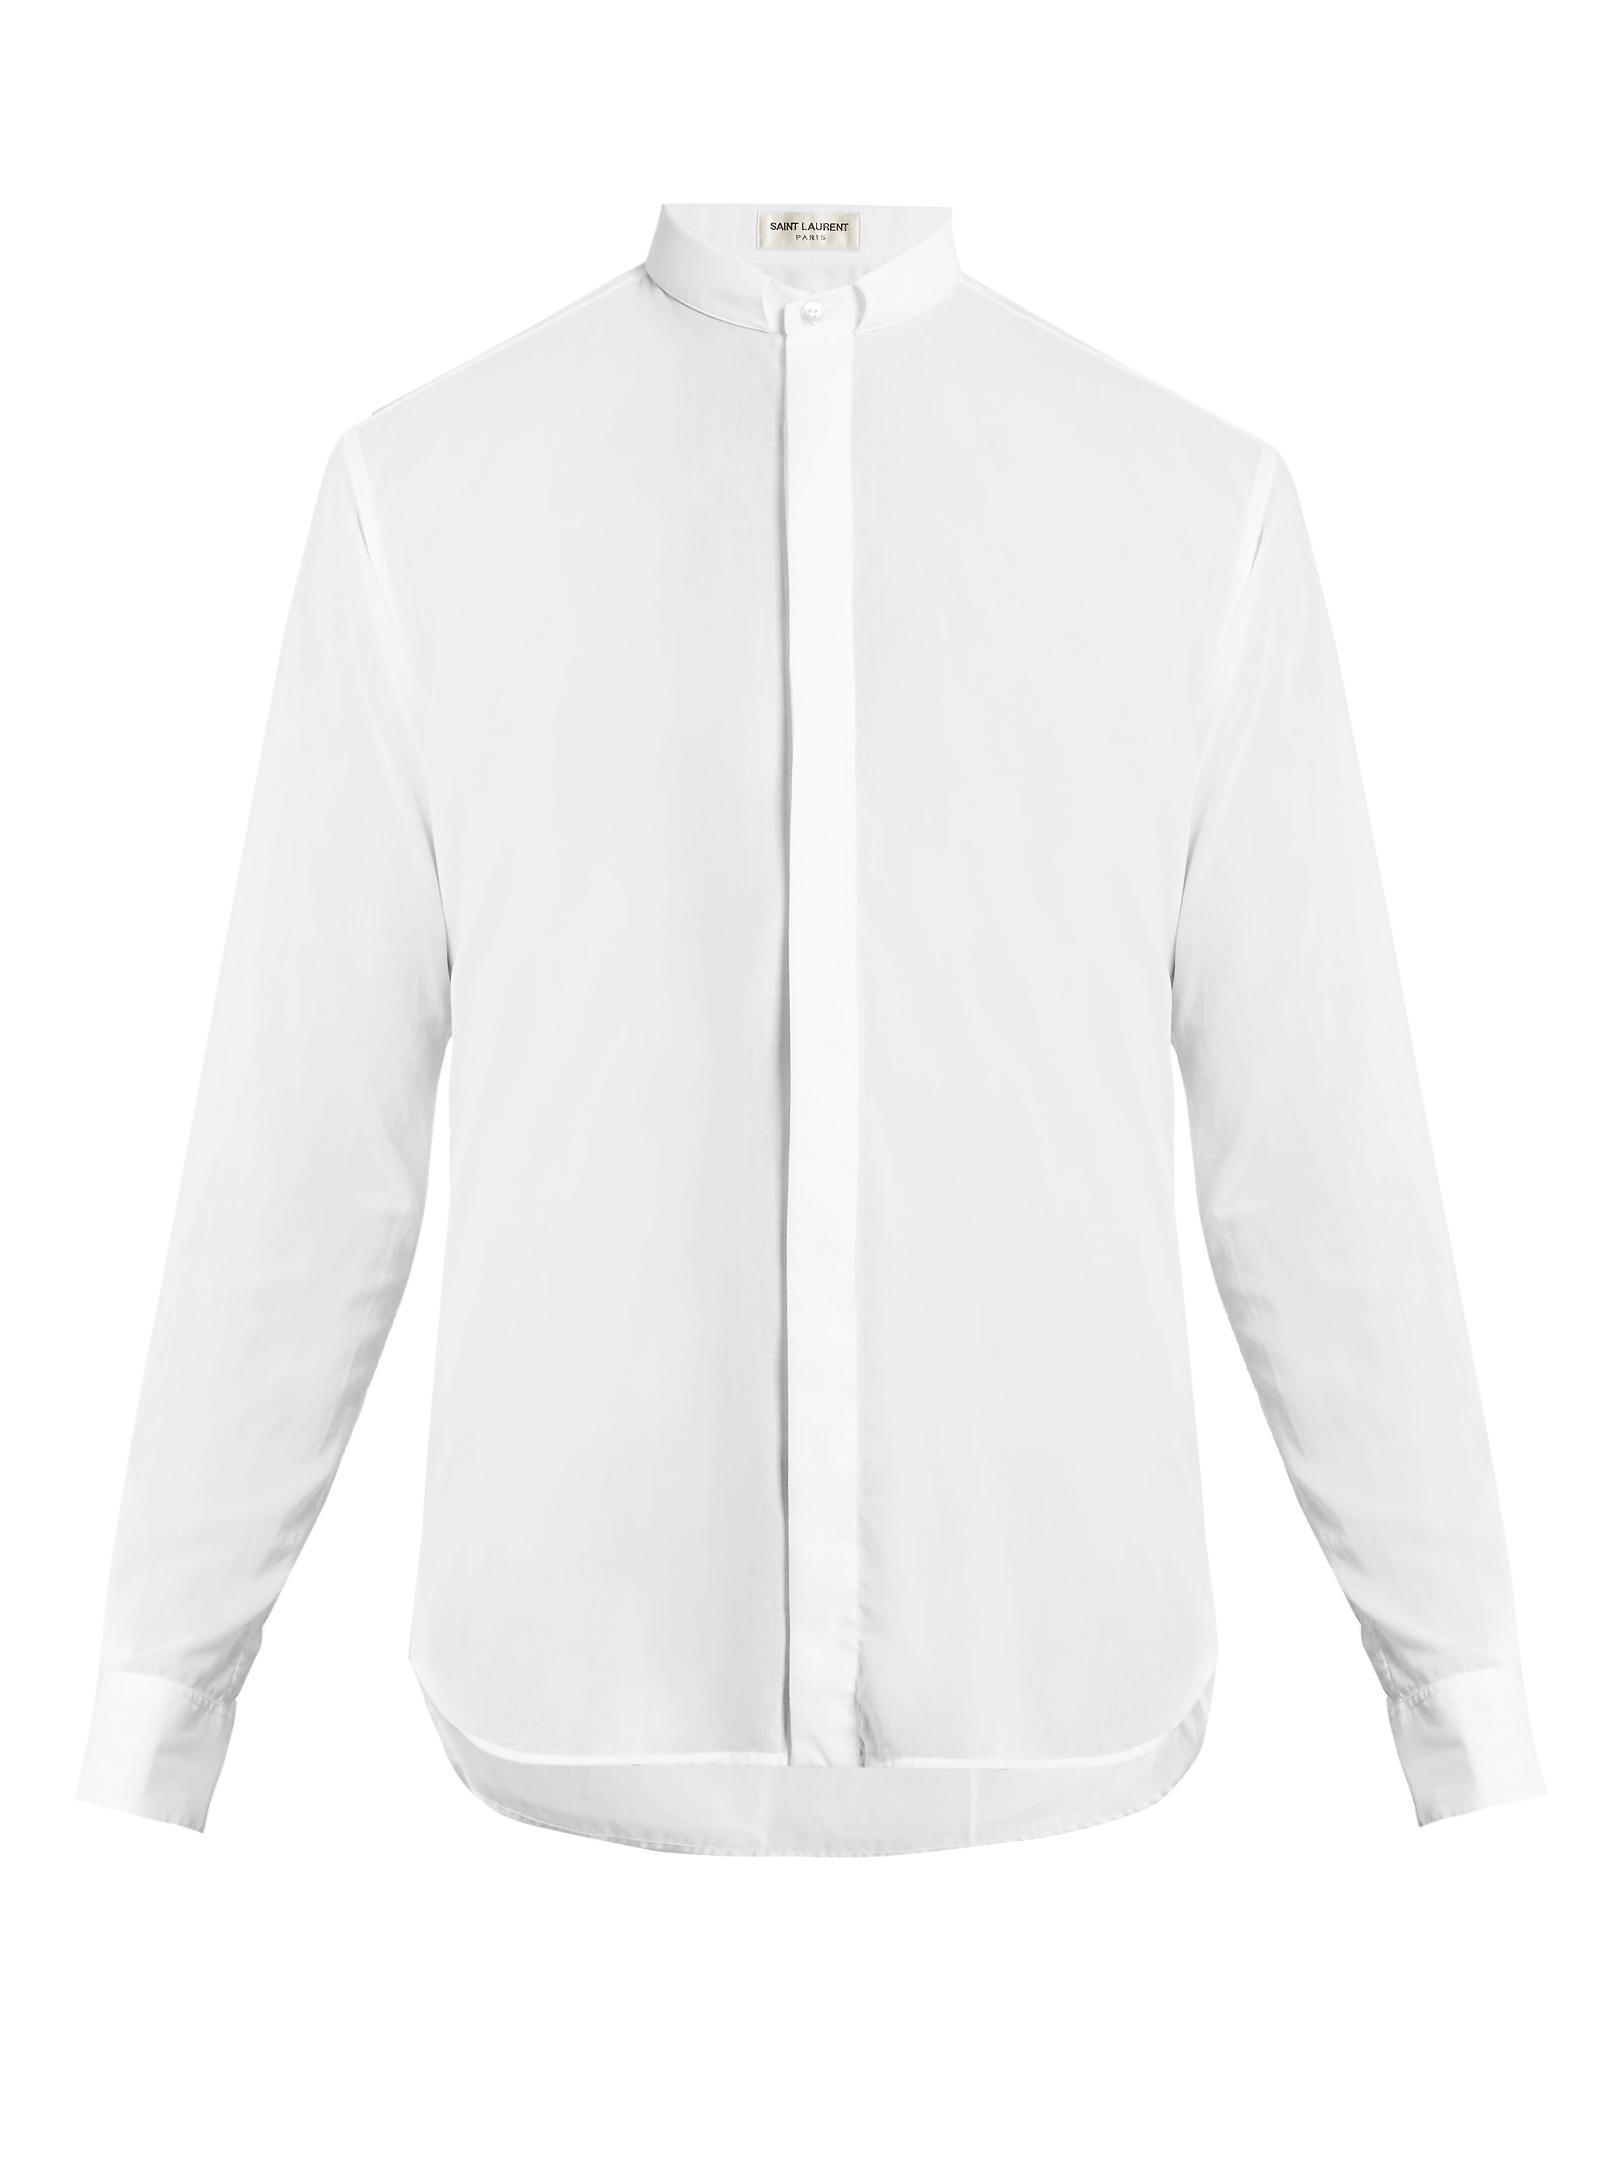 saint laurent narrow collar cotton shirt in white for men